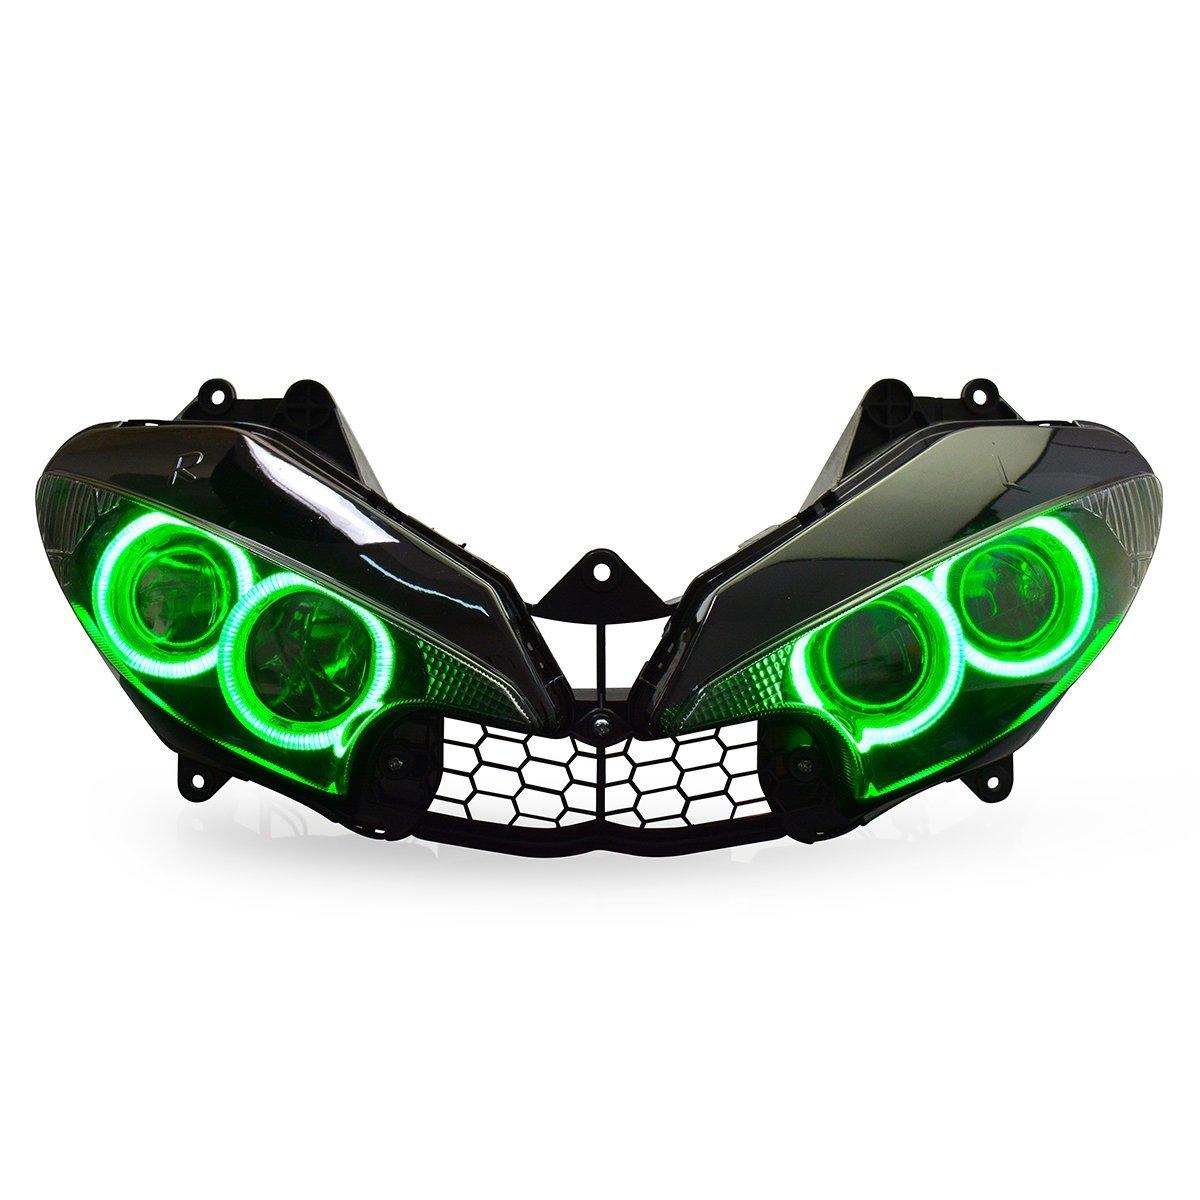 KT LED Headlight Assembly for Yamaha R6 2003 2004 2005 Green Angel Eye